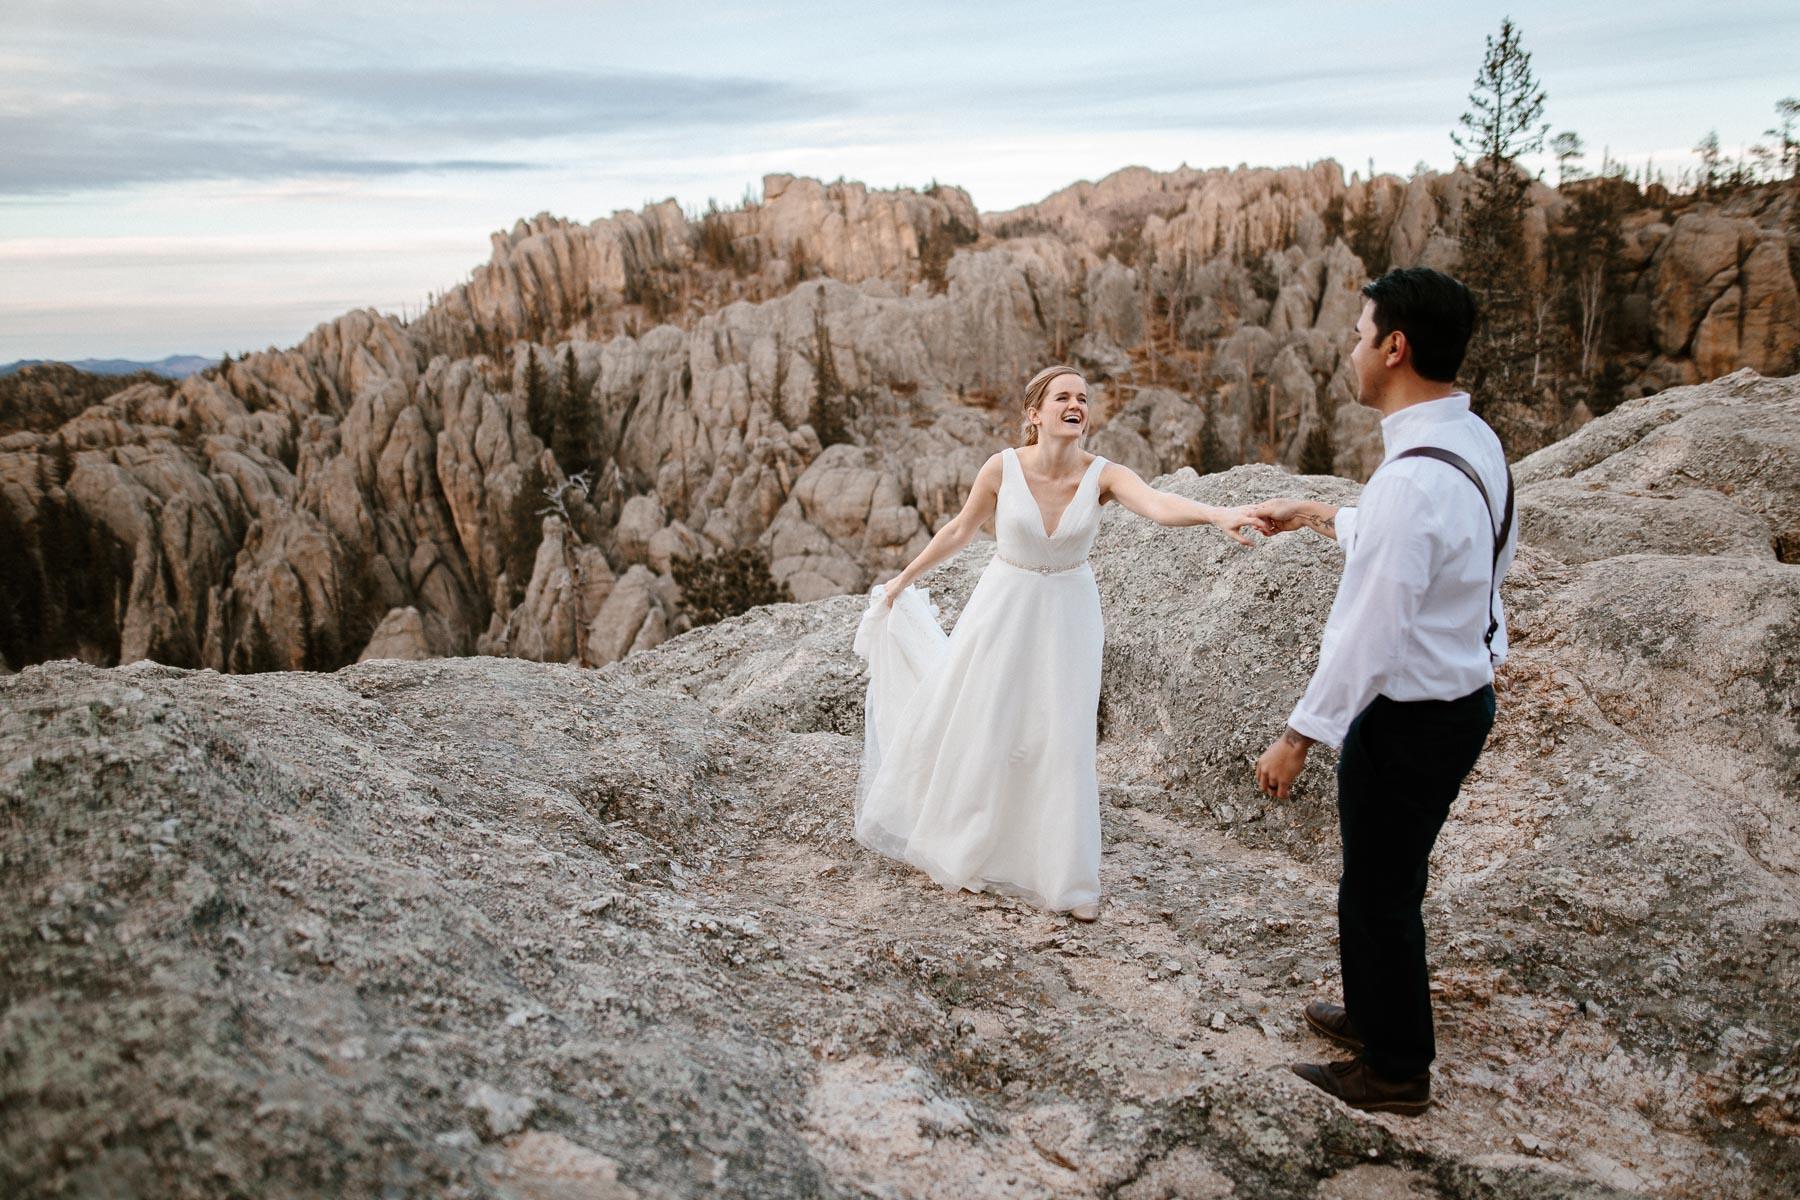 sioux-falls-black-hills-rapid-city-elopement-wedding-adventure-photographer-custer-sylvan-lake-46.jpg